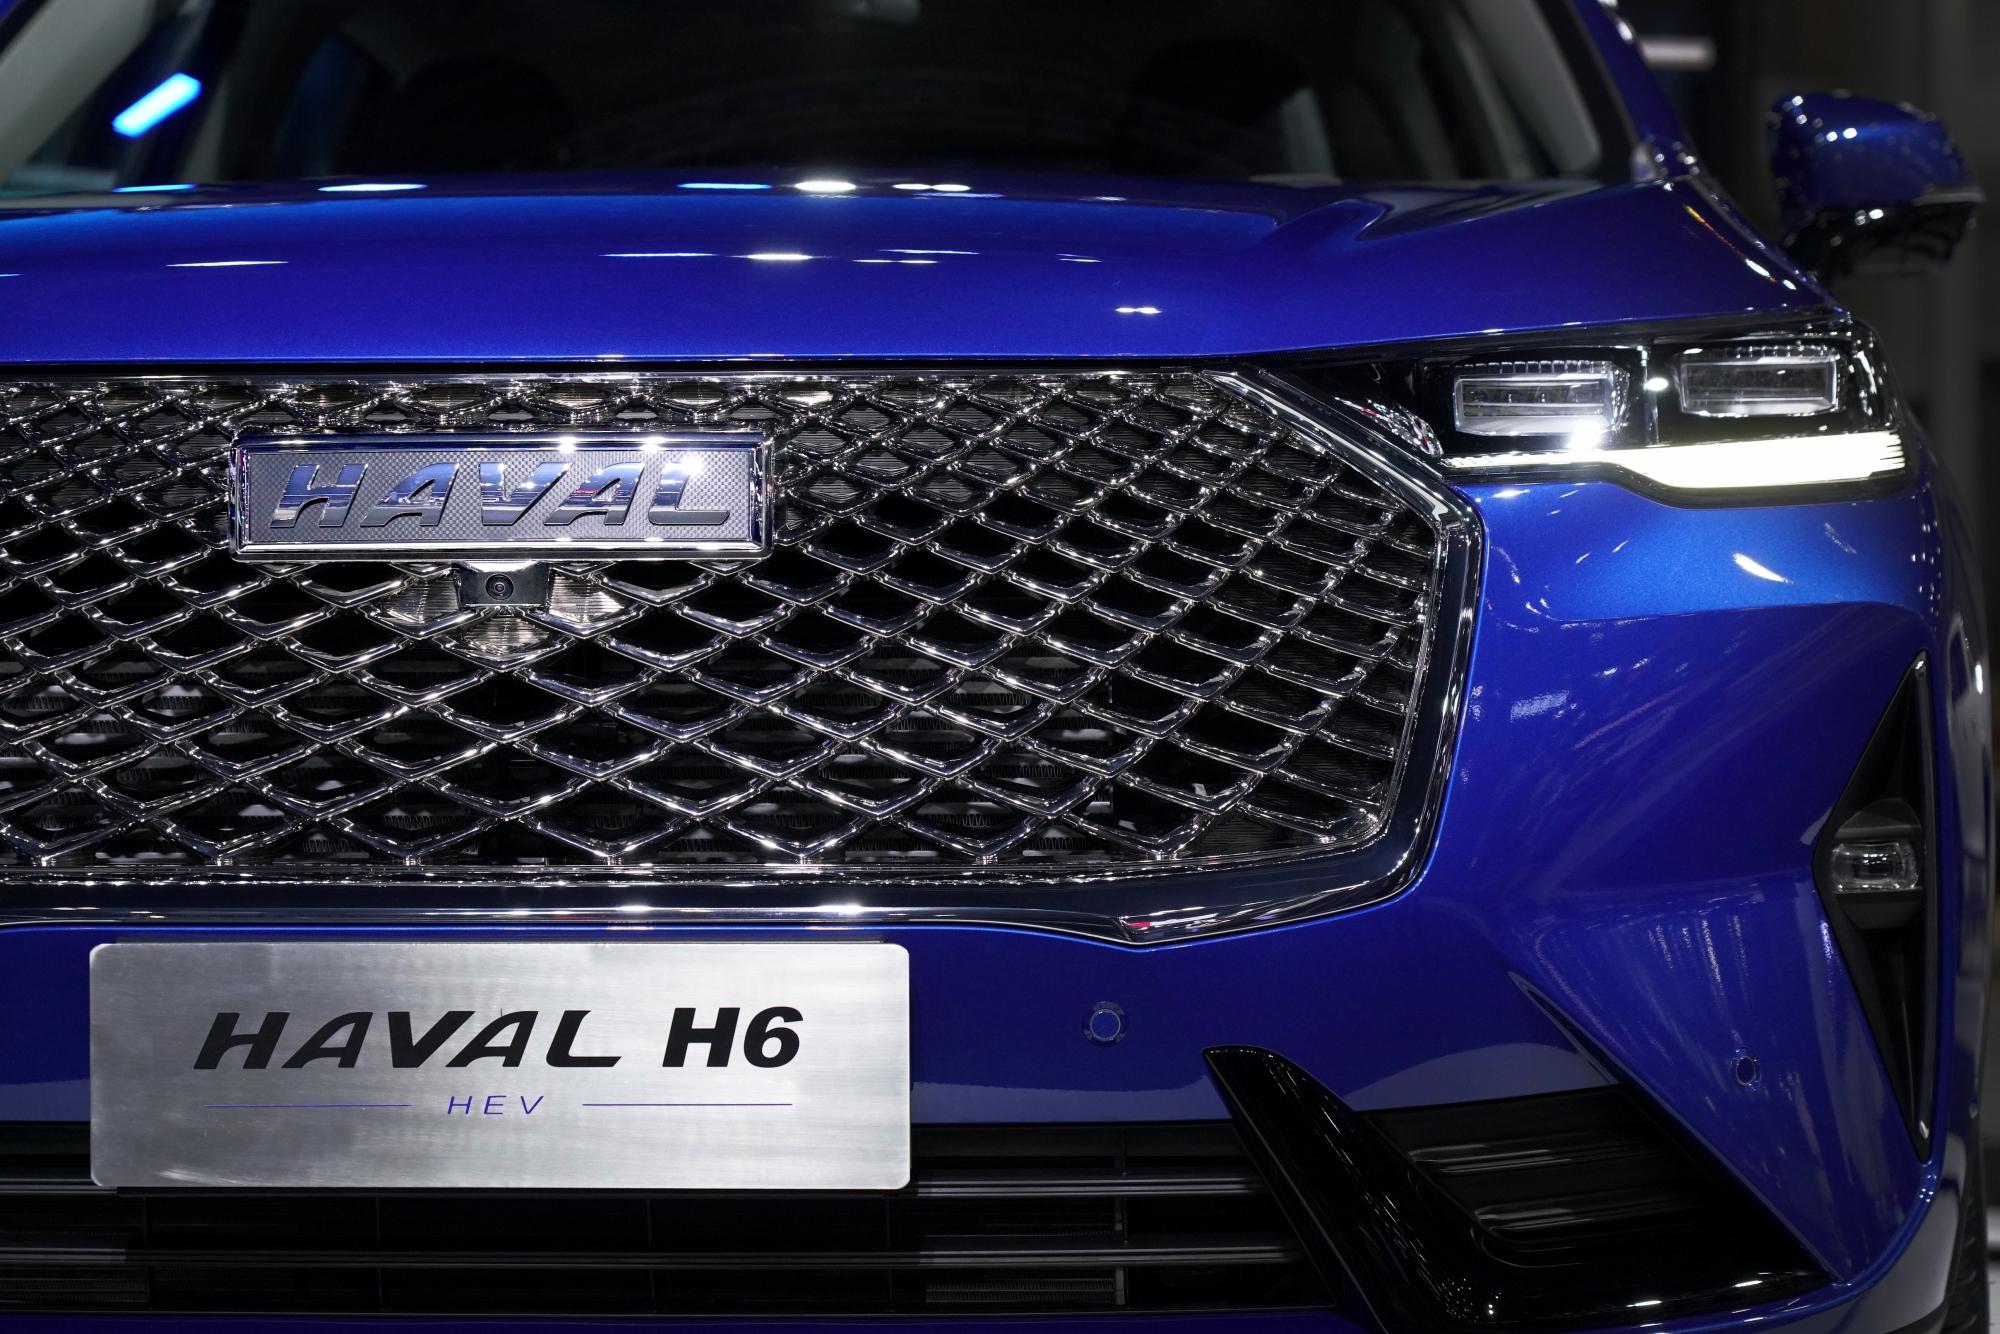 Haval H6 Hybrid Autoinfo (8)